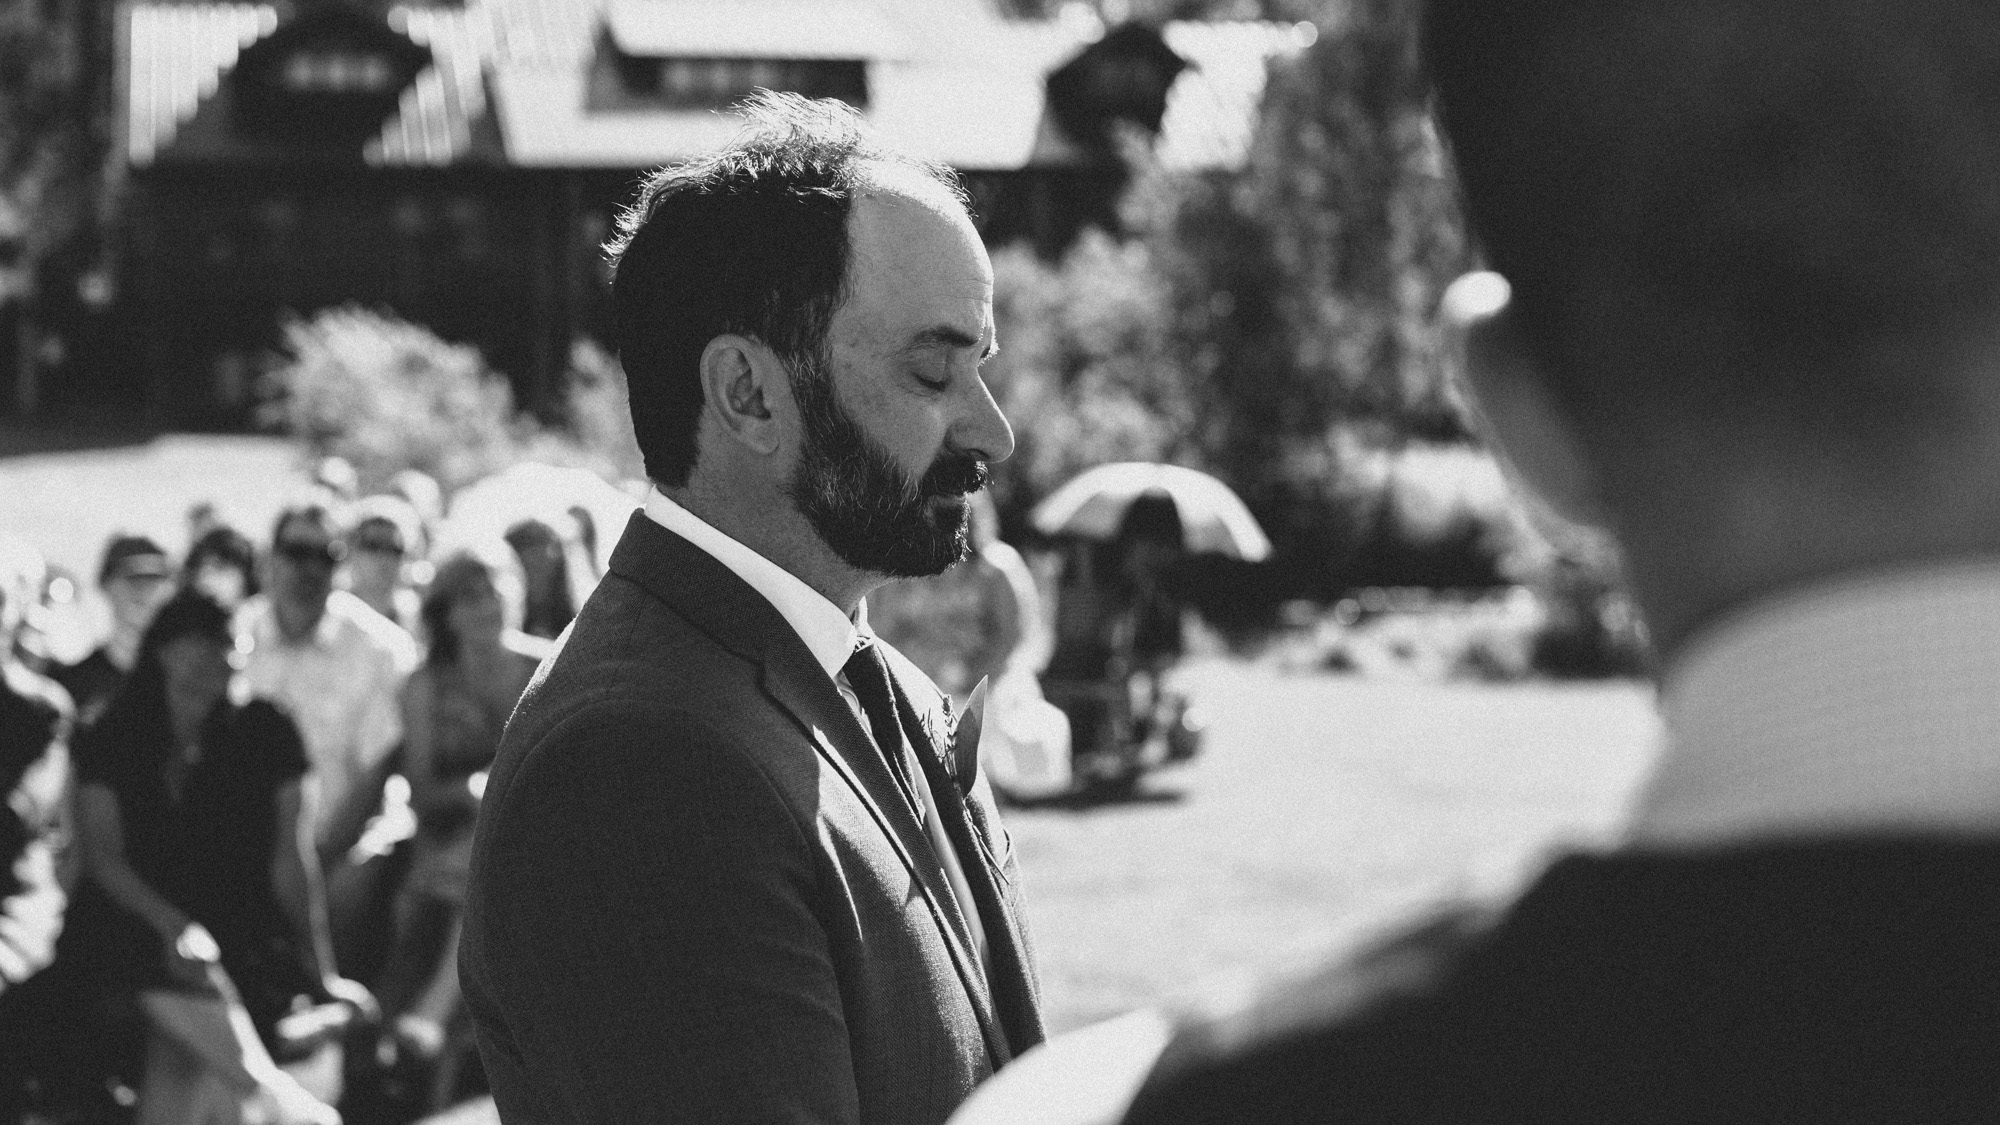 Montana_Wedding_Photos_alec_vanderboom-0090.jpg